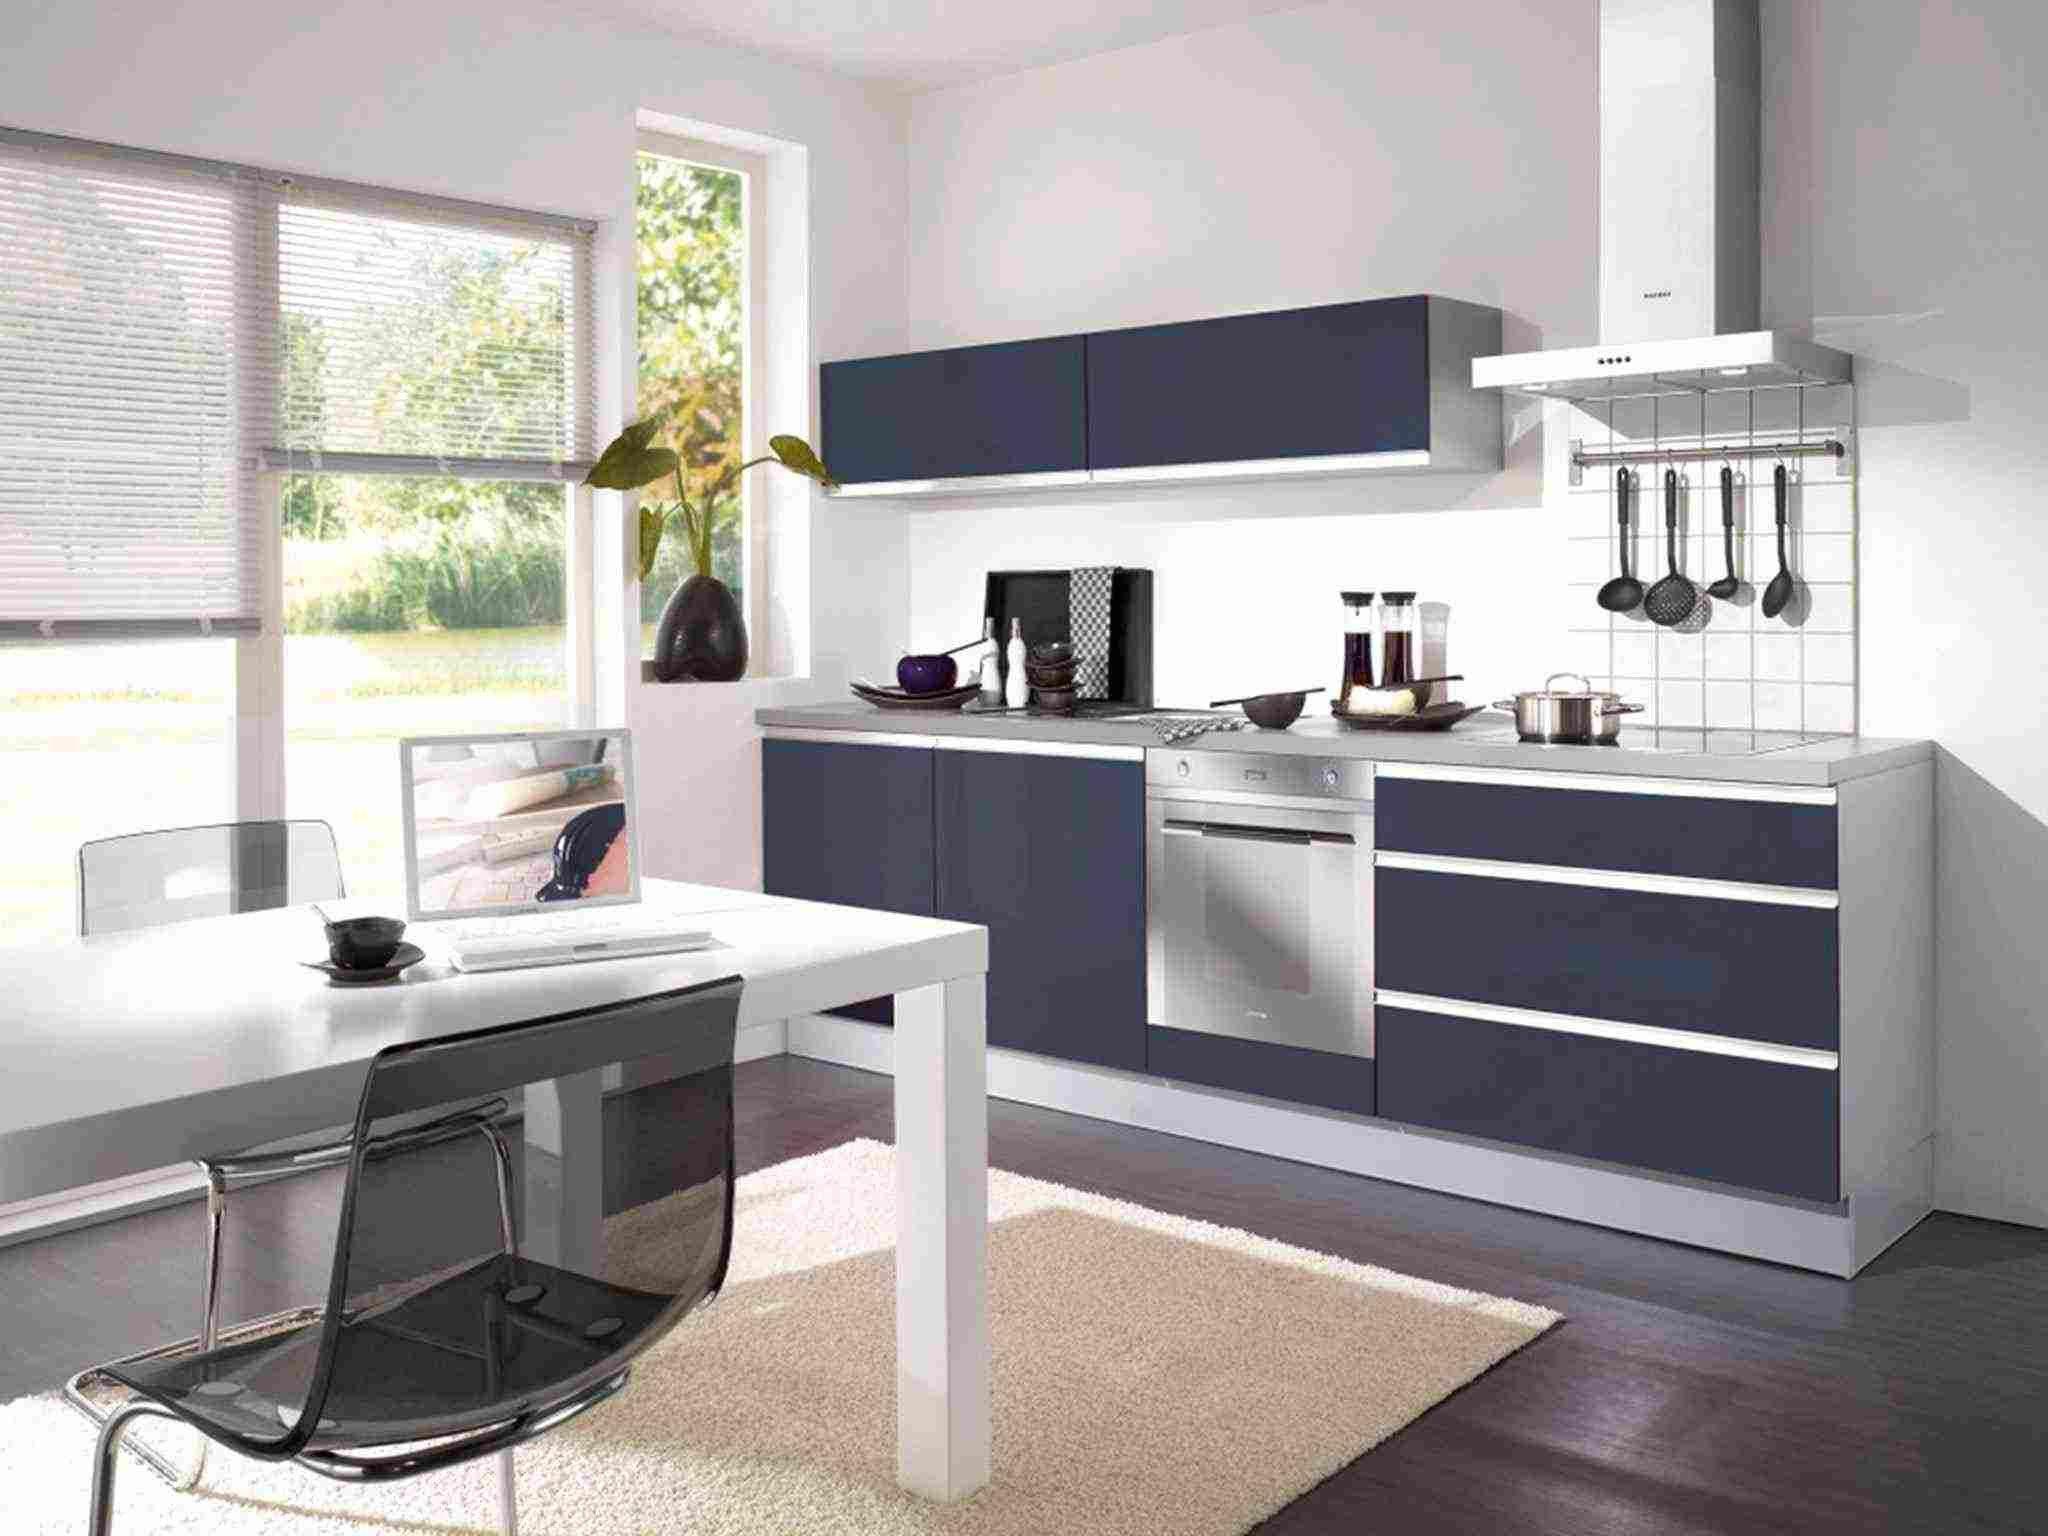 Best Of Cuisine Alno Avis Alno Home Decor Home